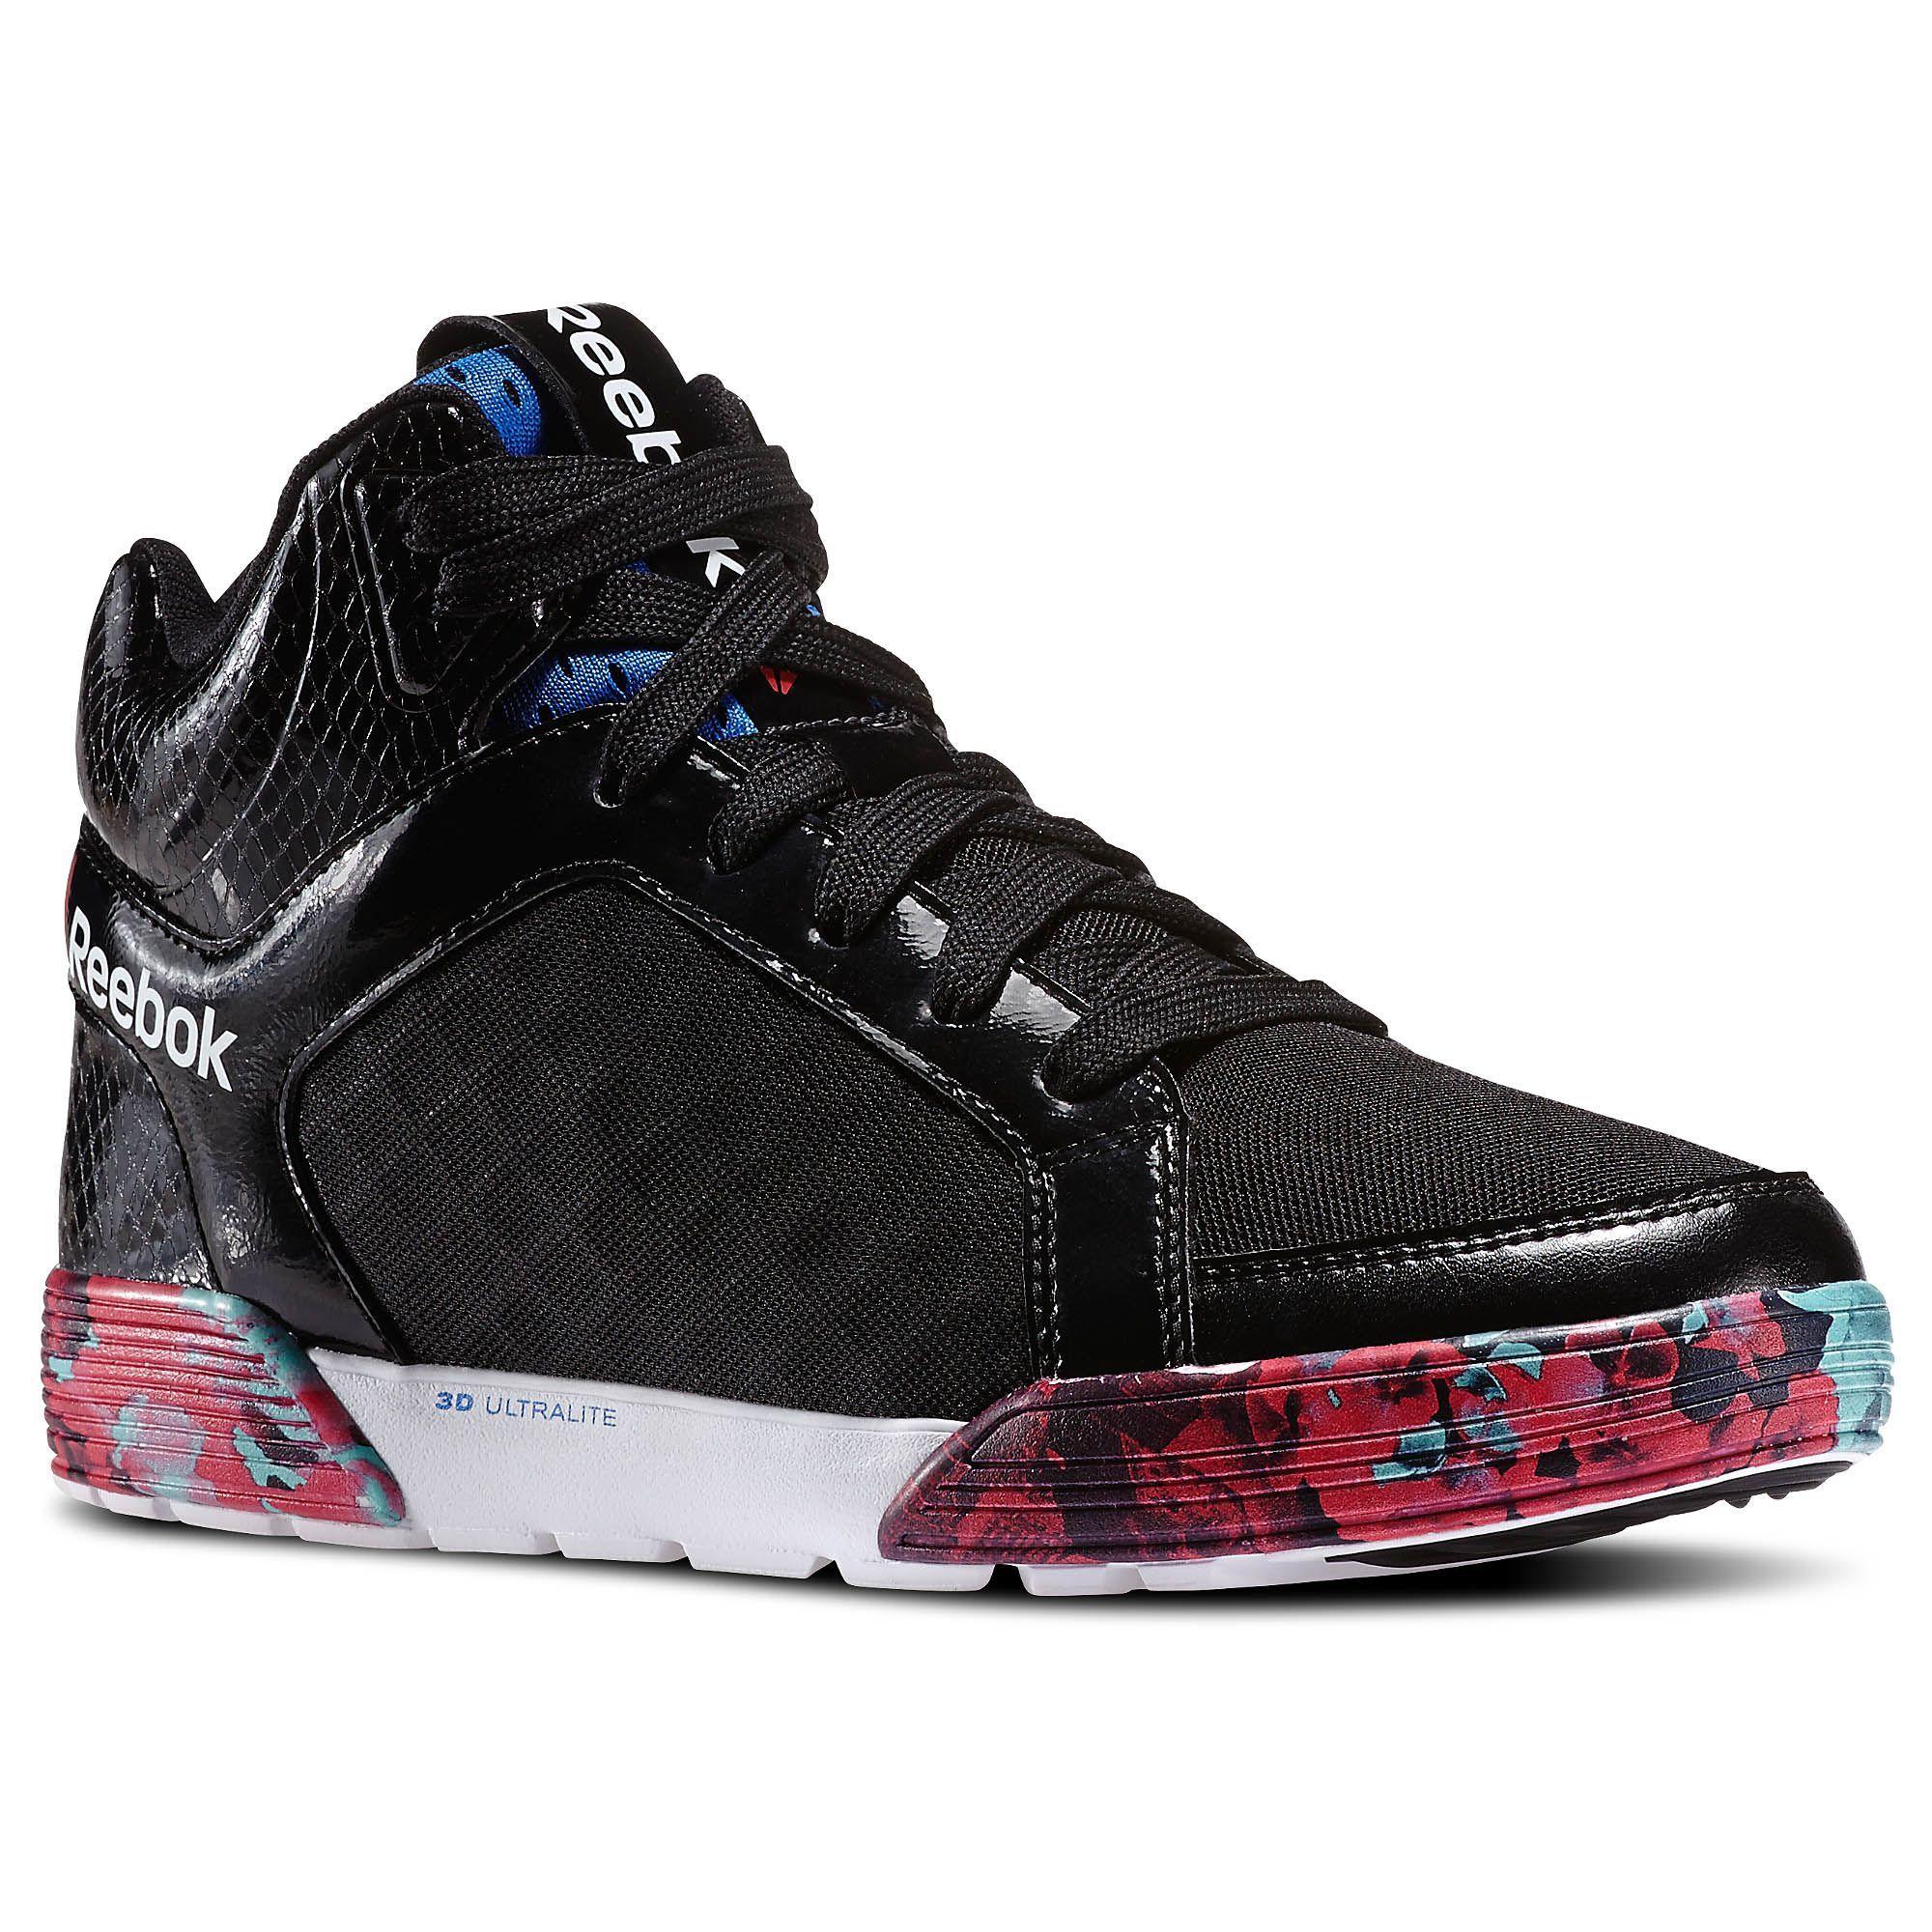 Dance Apparel & Shoes | Tops, Capris, Sneakers | Reebok US